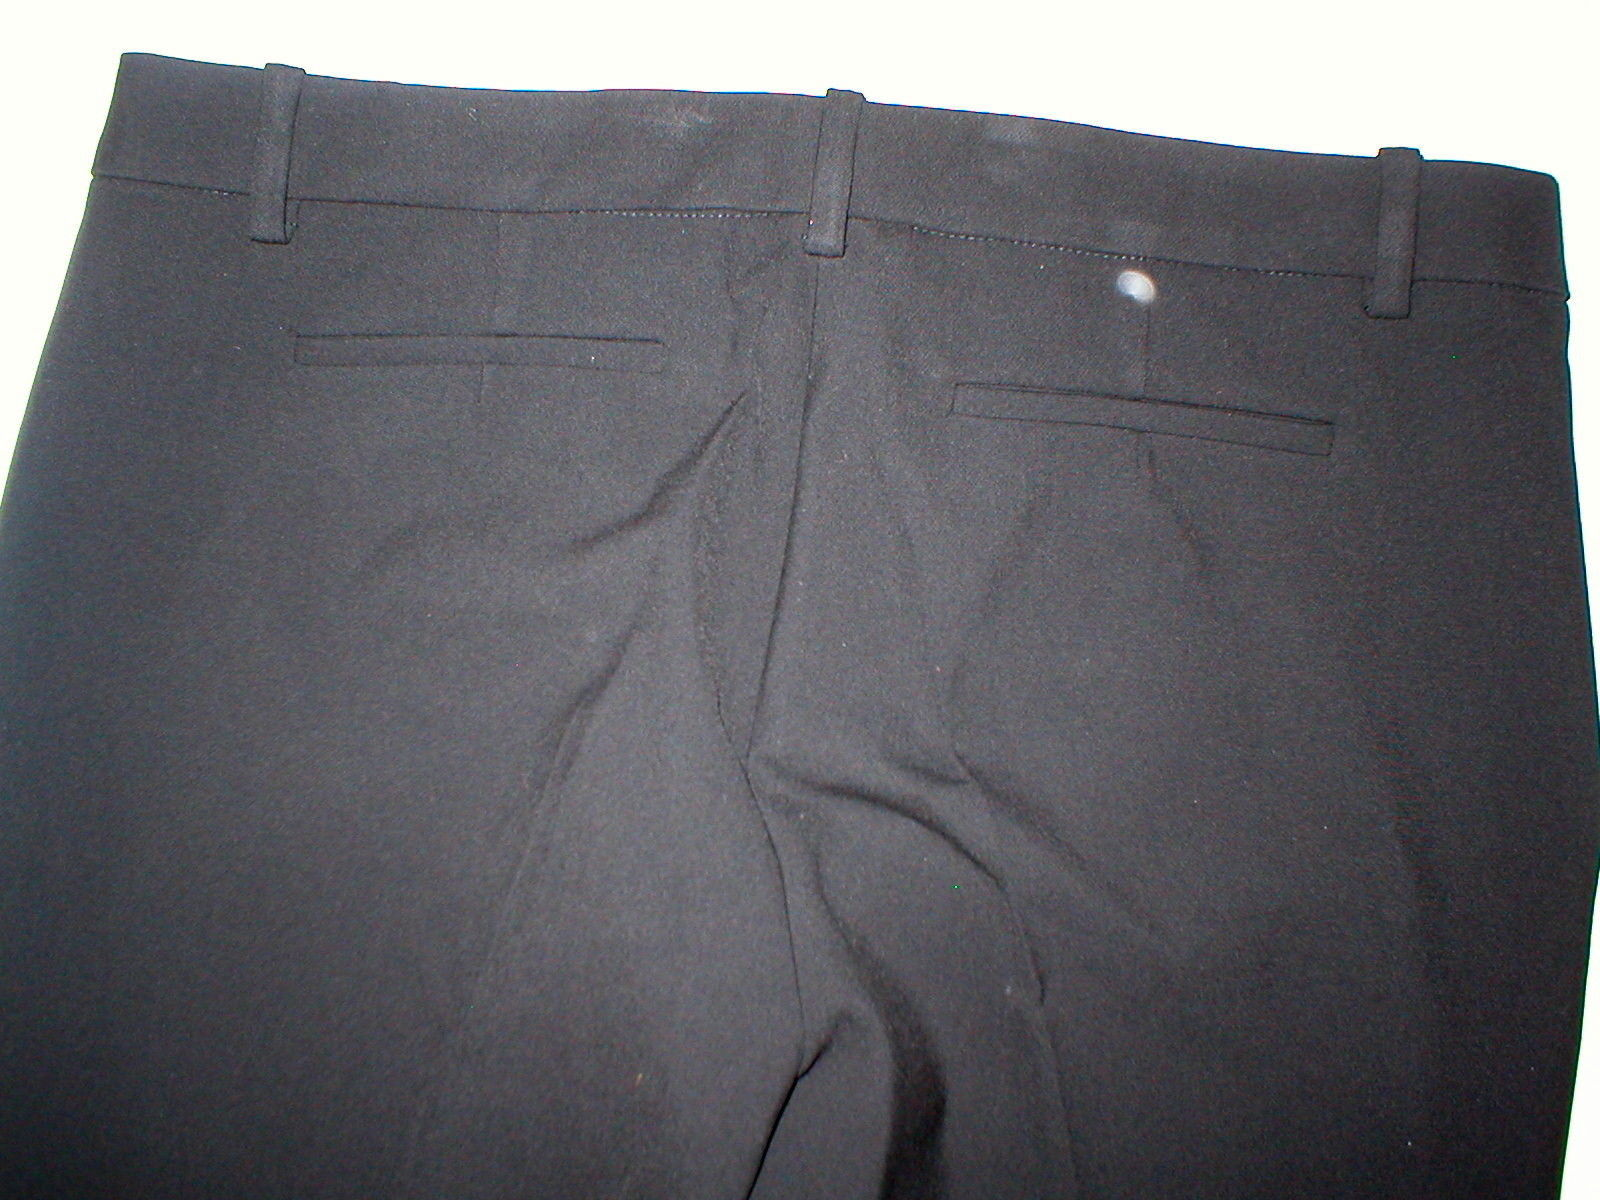 New NWT Womens Designer Trina Turk Black Pants Slacks 12 Aubree Office USA Work